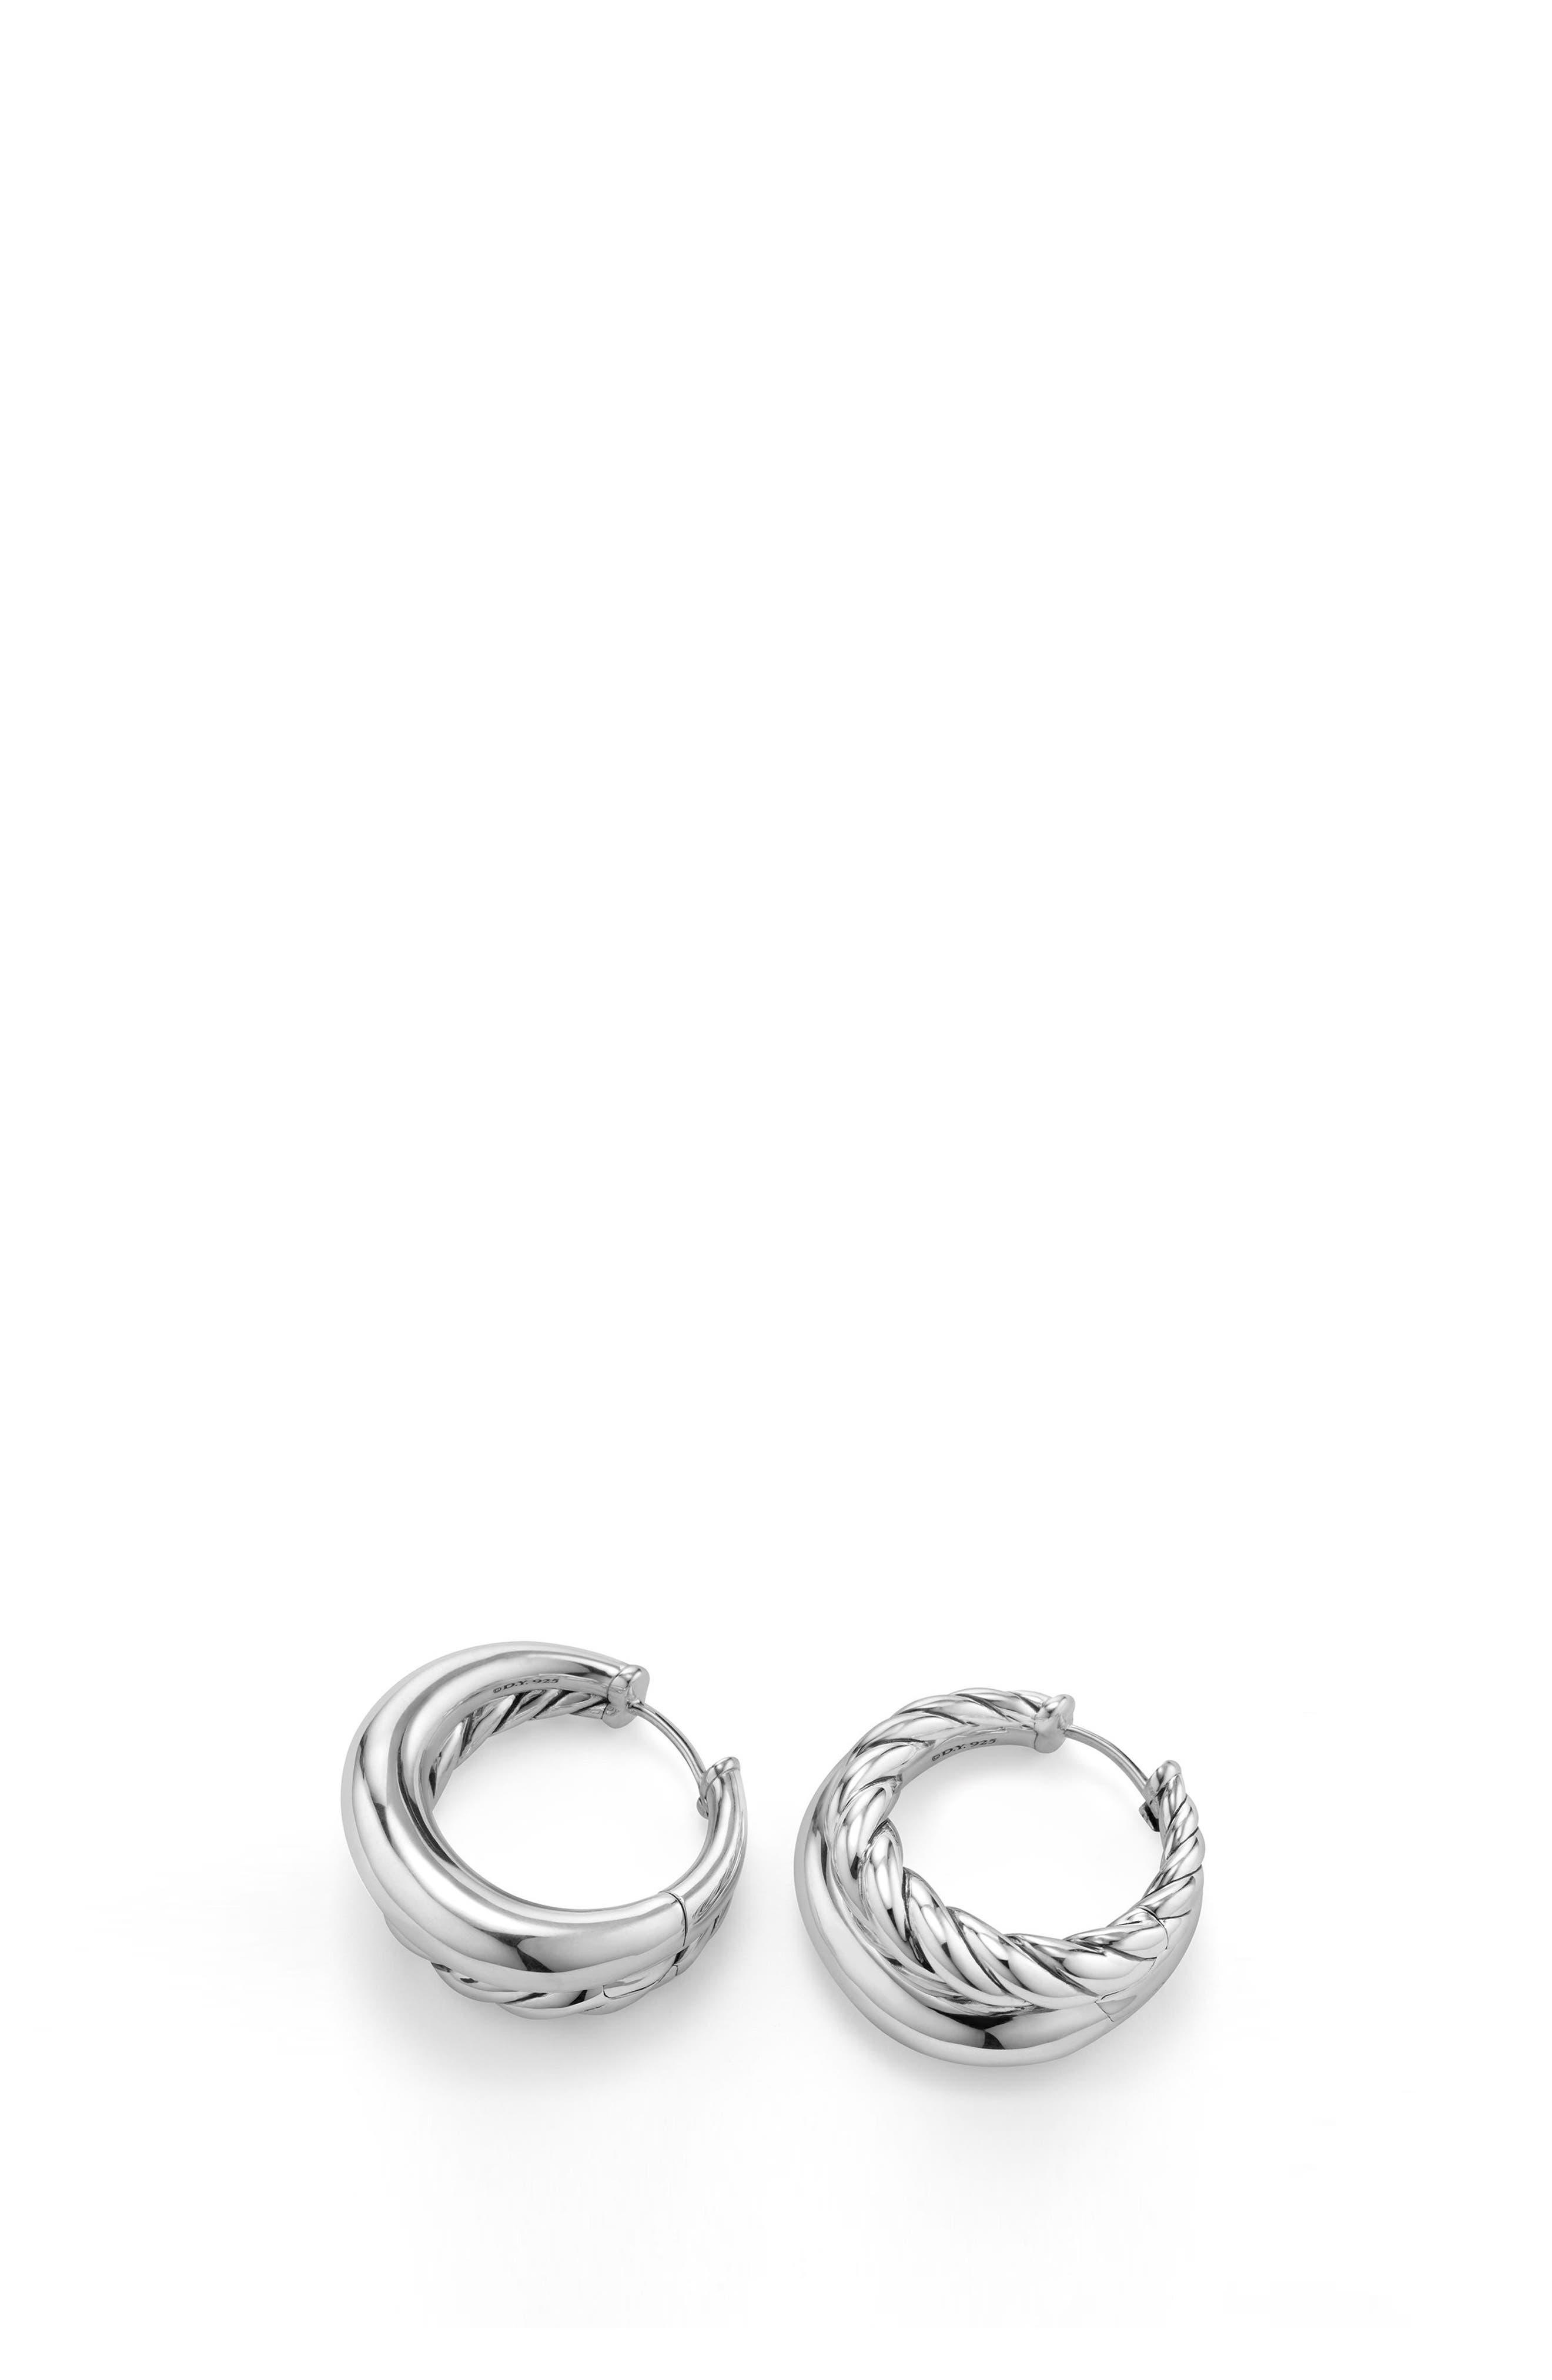 Pure Form Hoop Earrings, 25.5mm,                             Alternate thumbnail 2, color,                             Silver